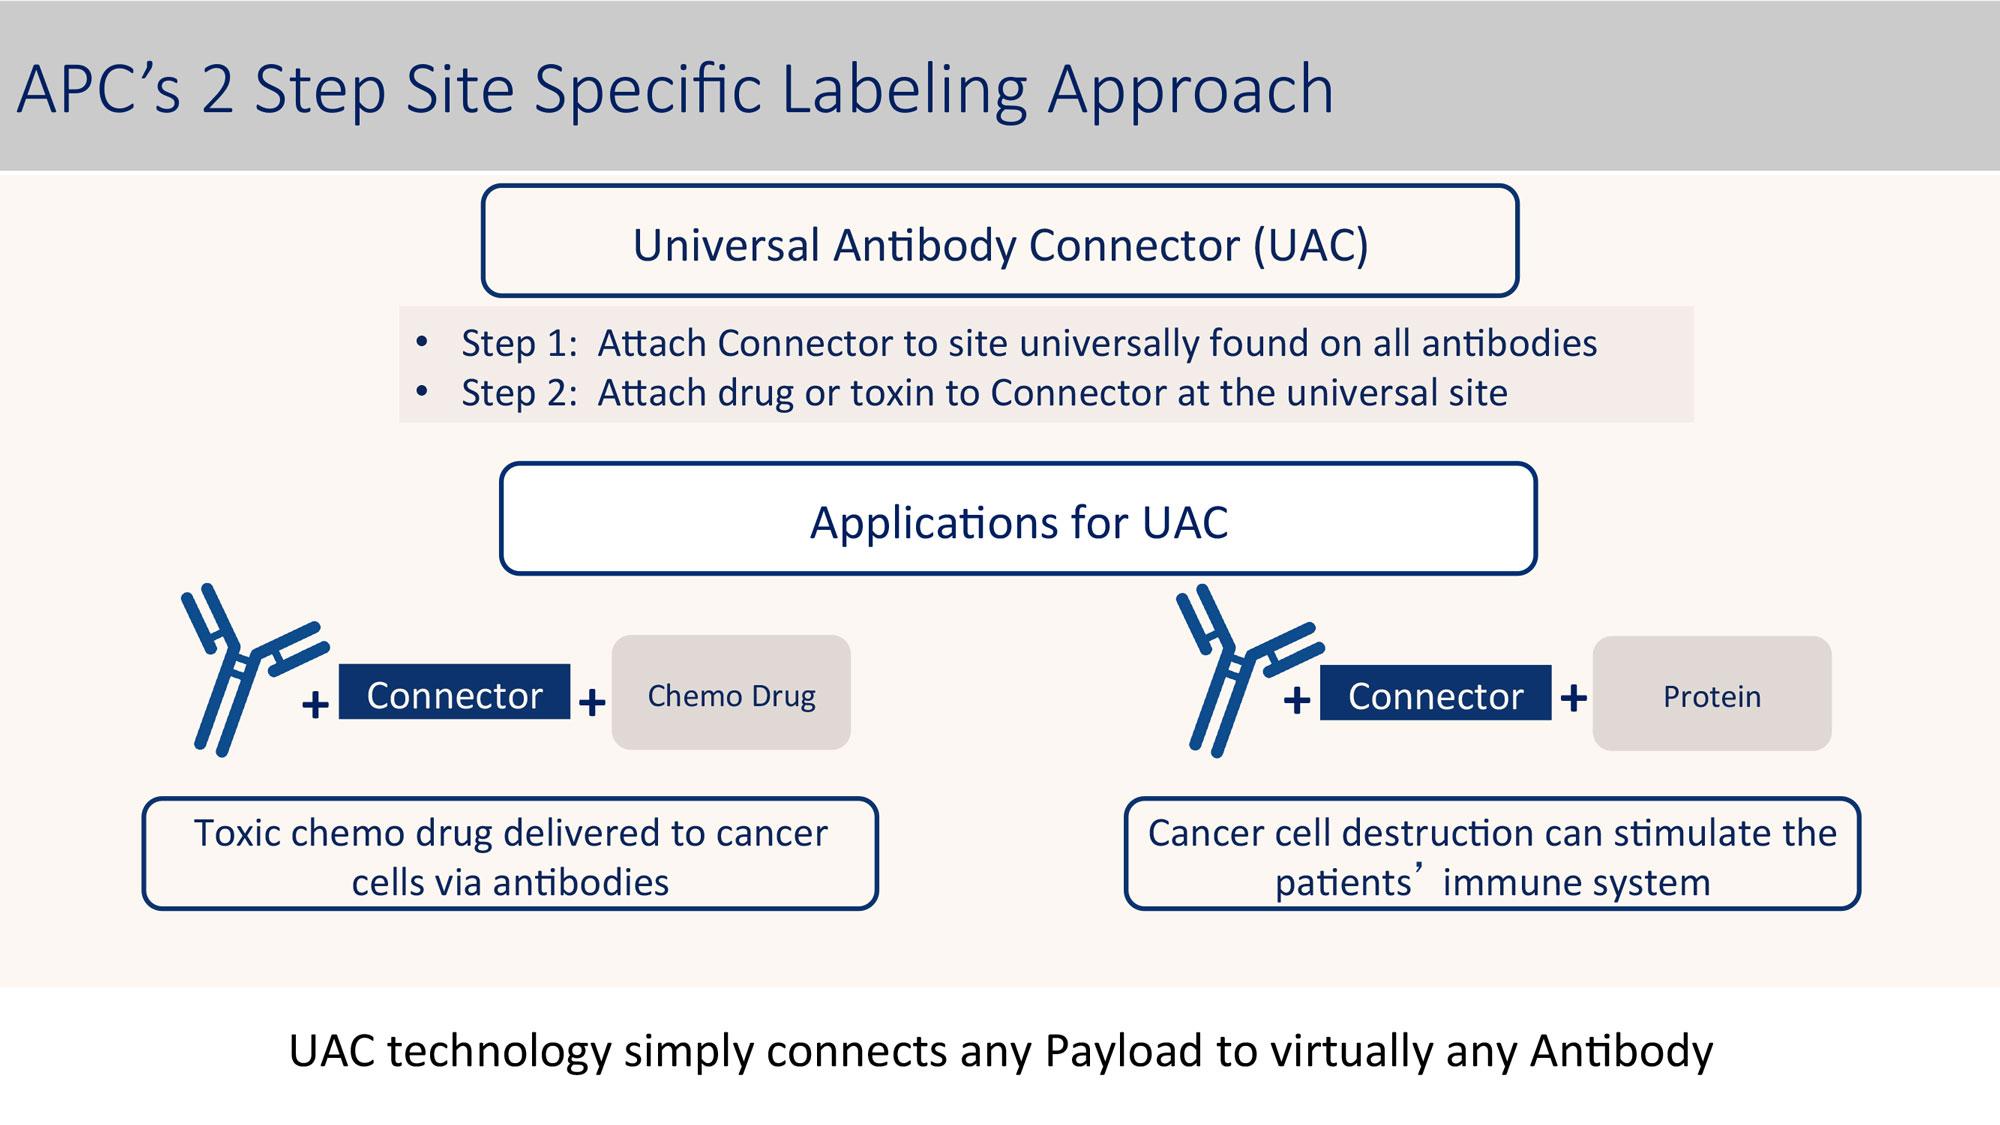 APC Labeling Approach